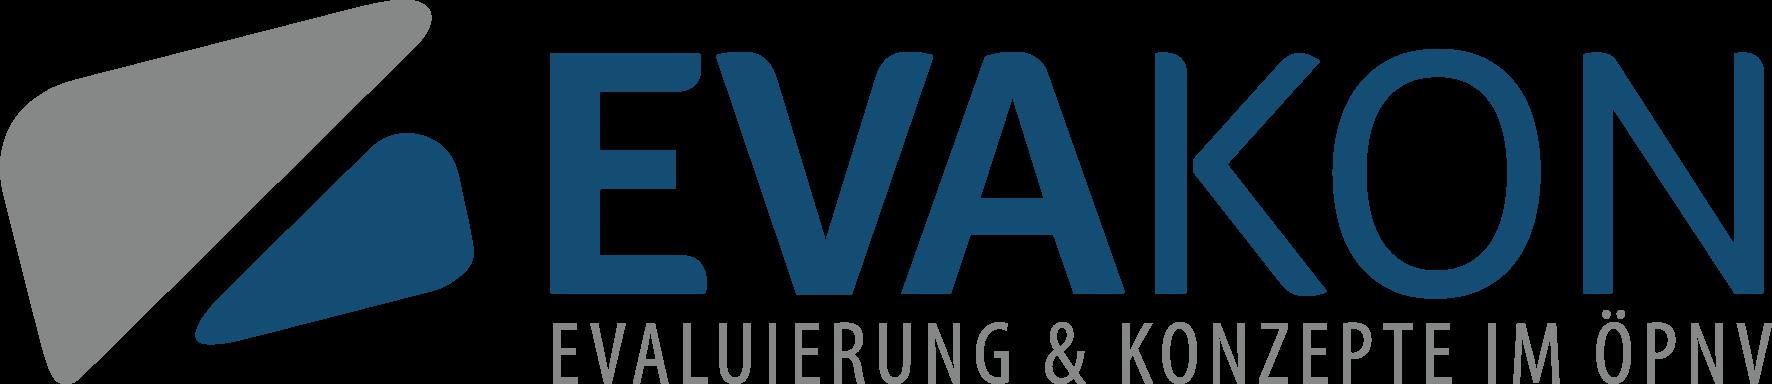 EVAKON GmbH